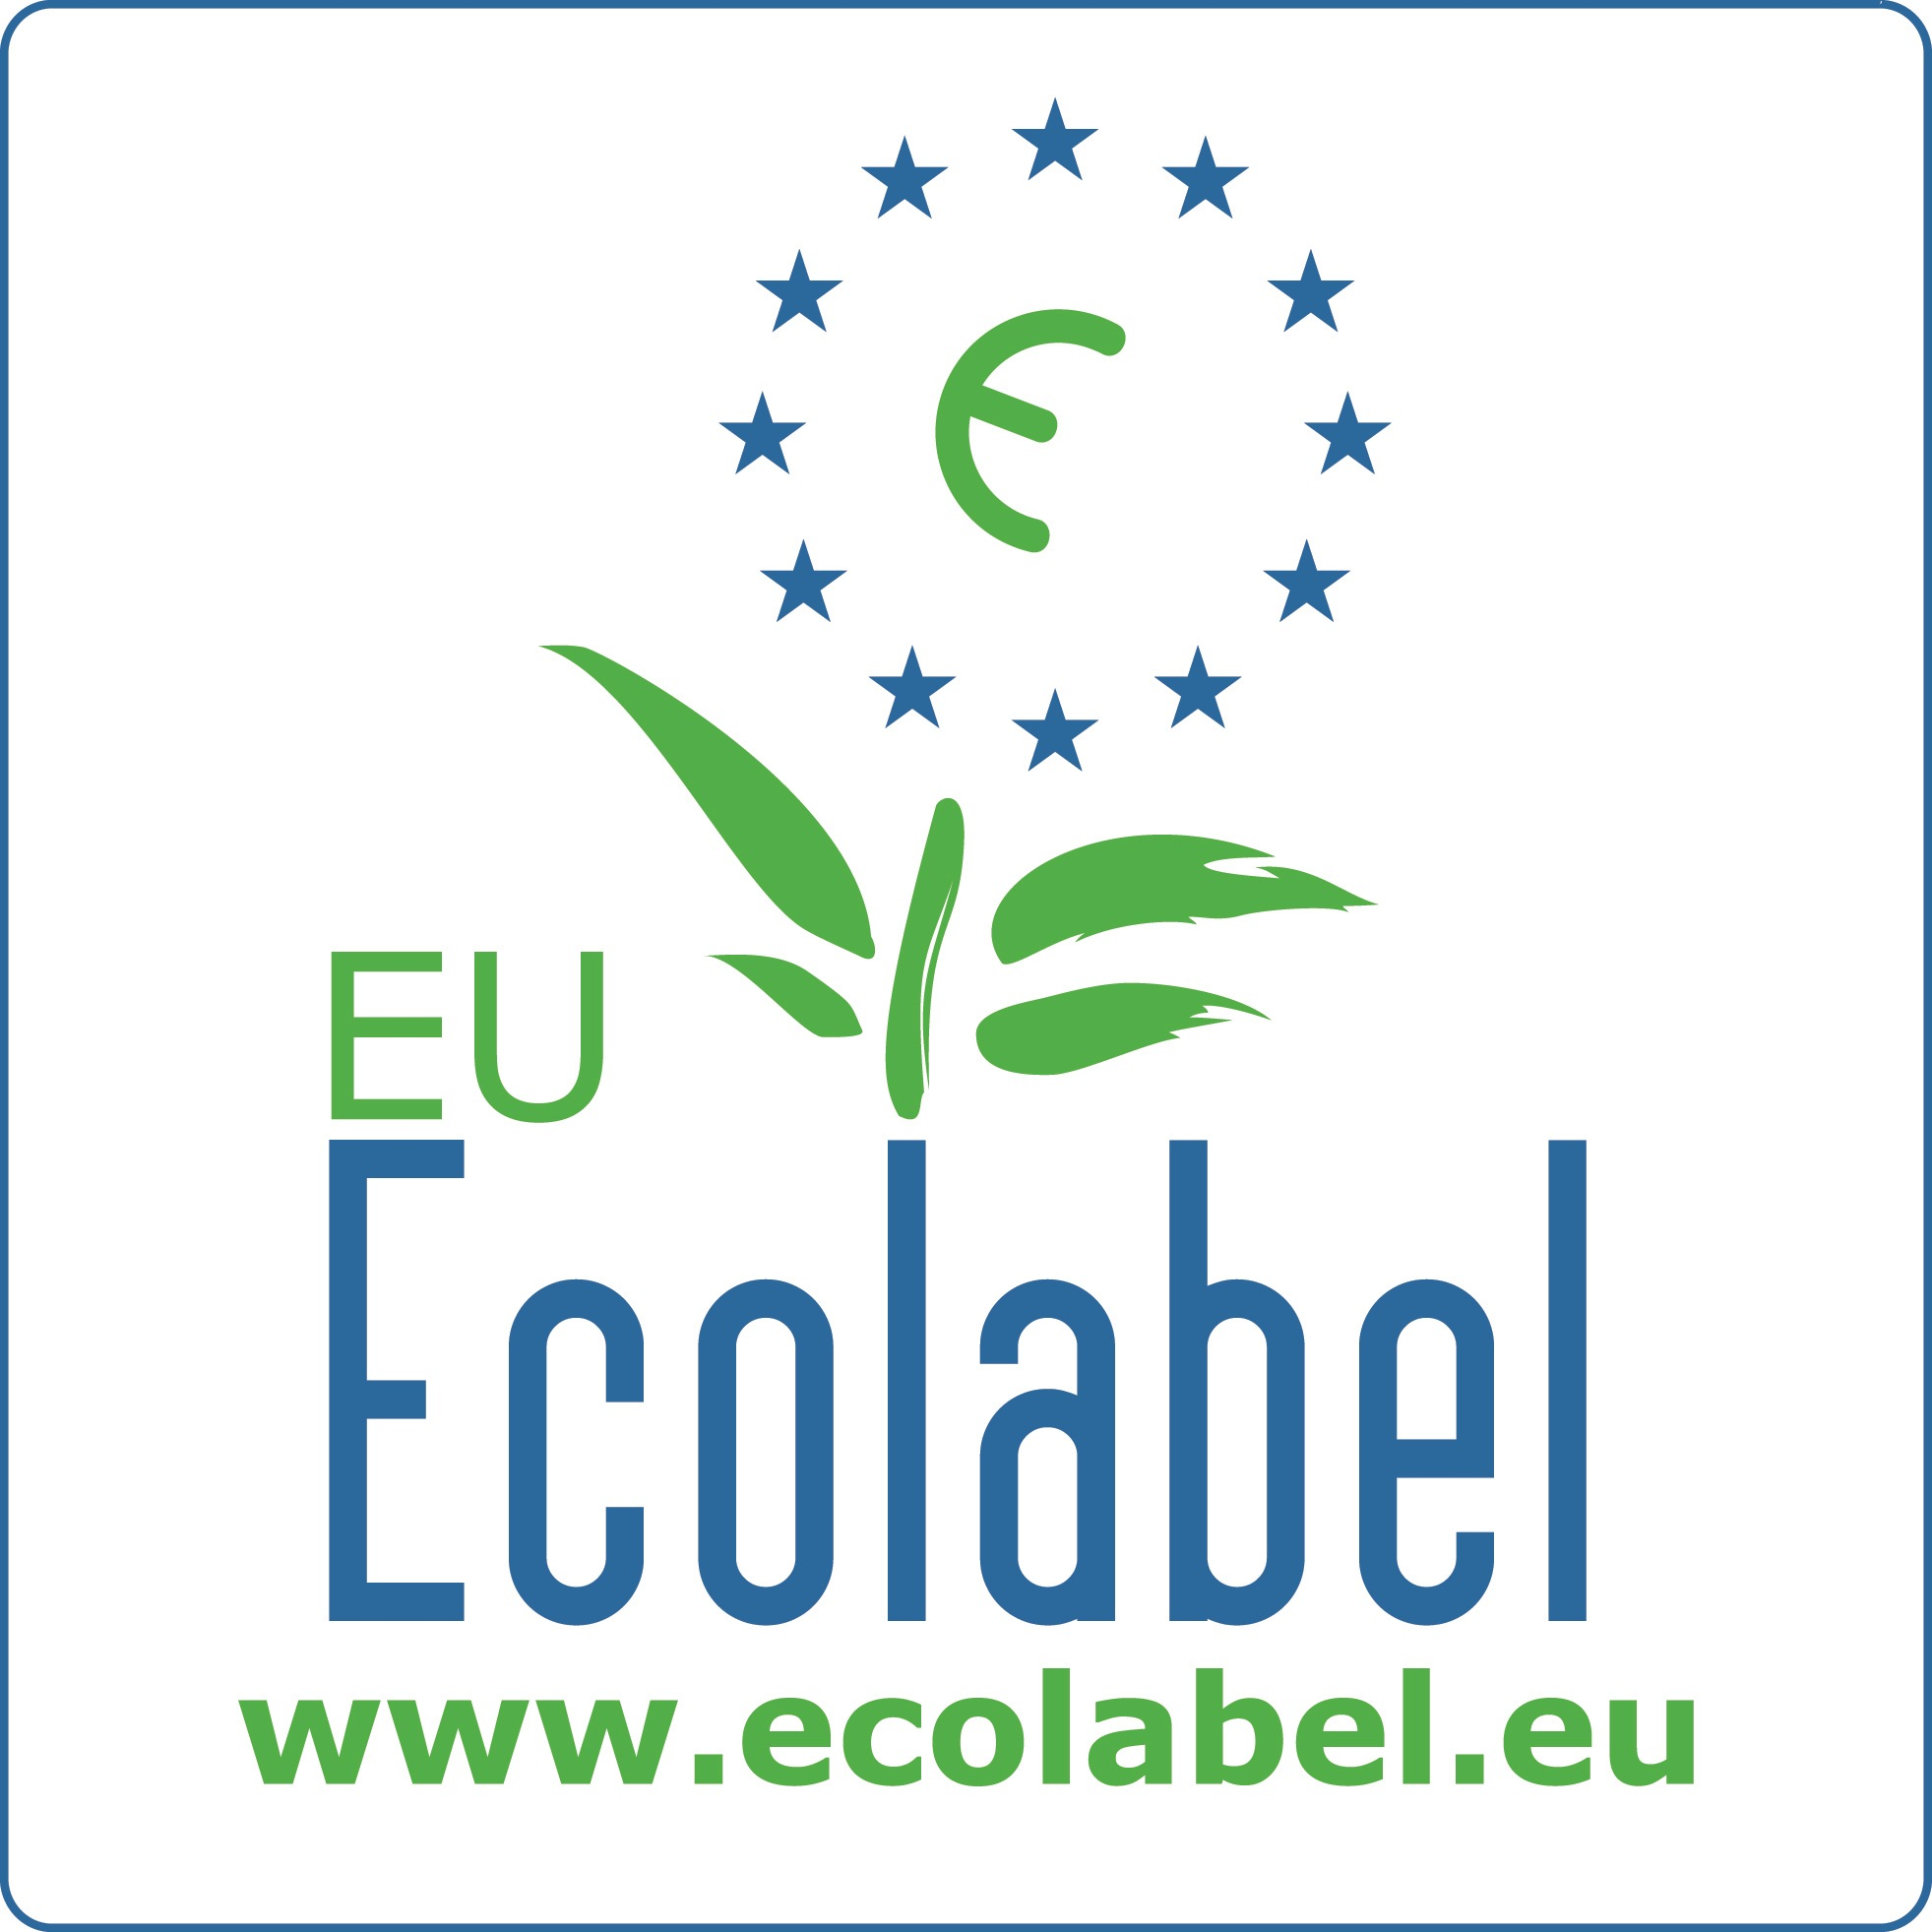 Ecolabel Logo